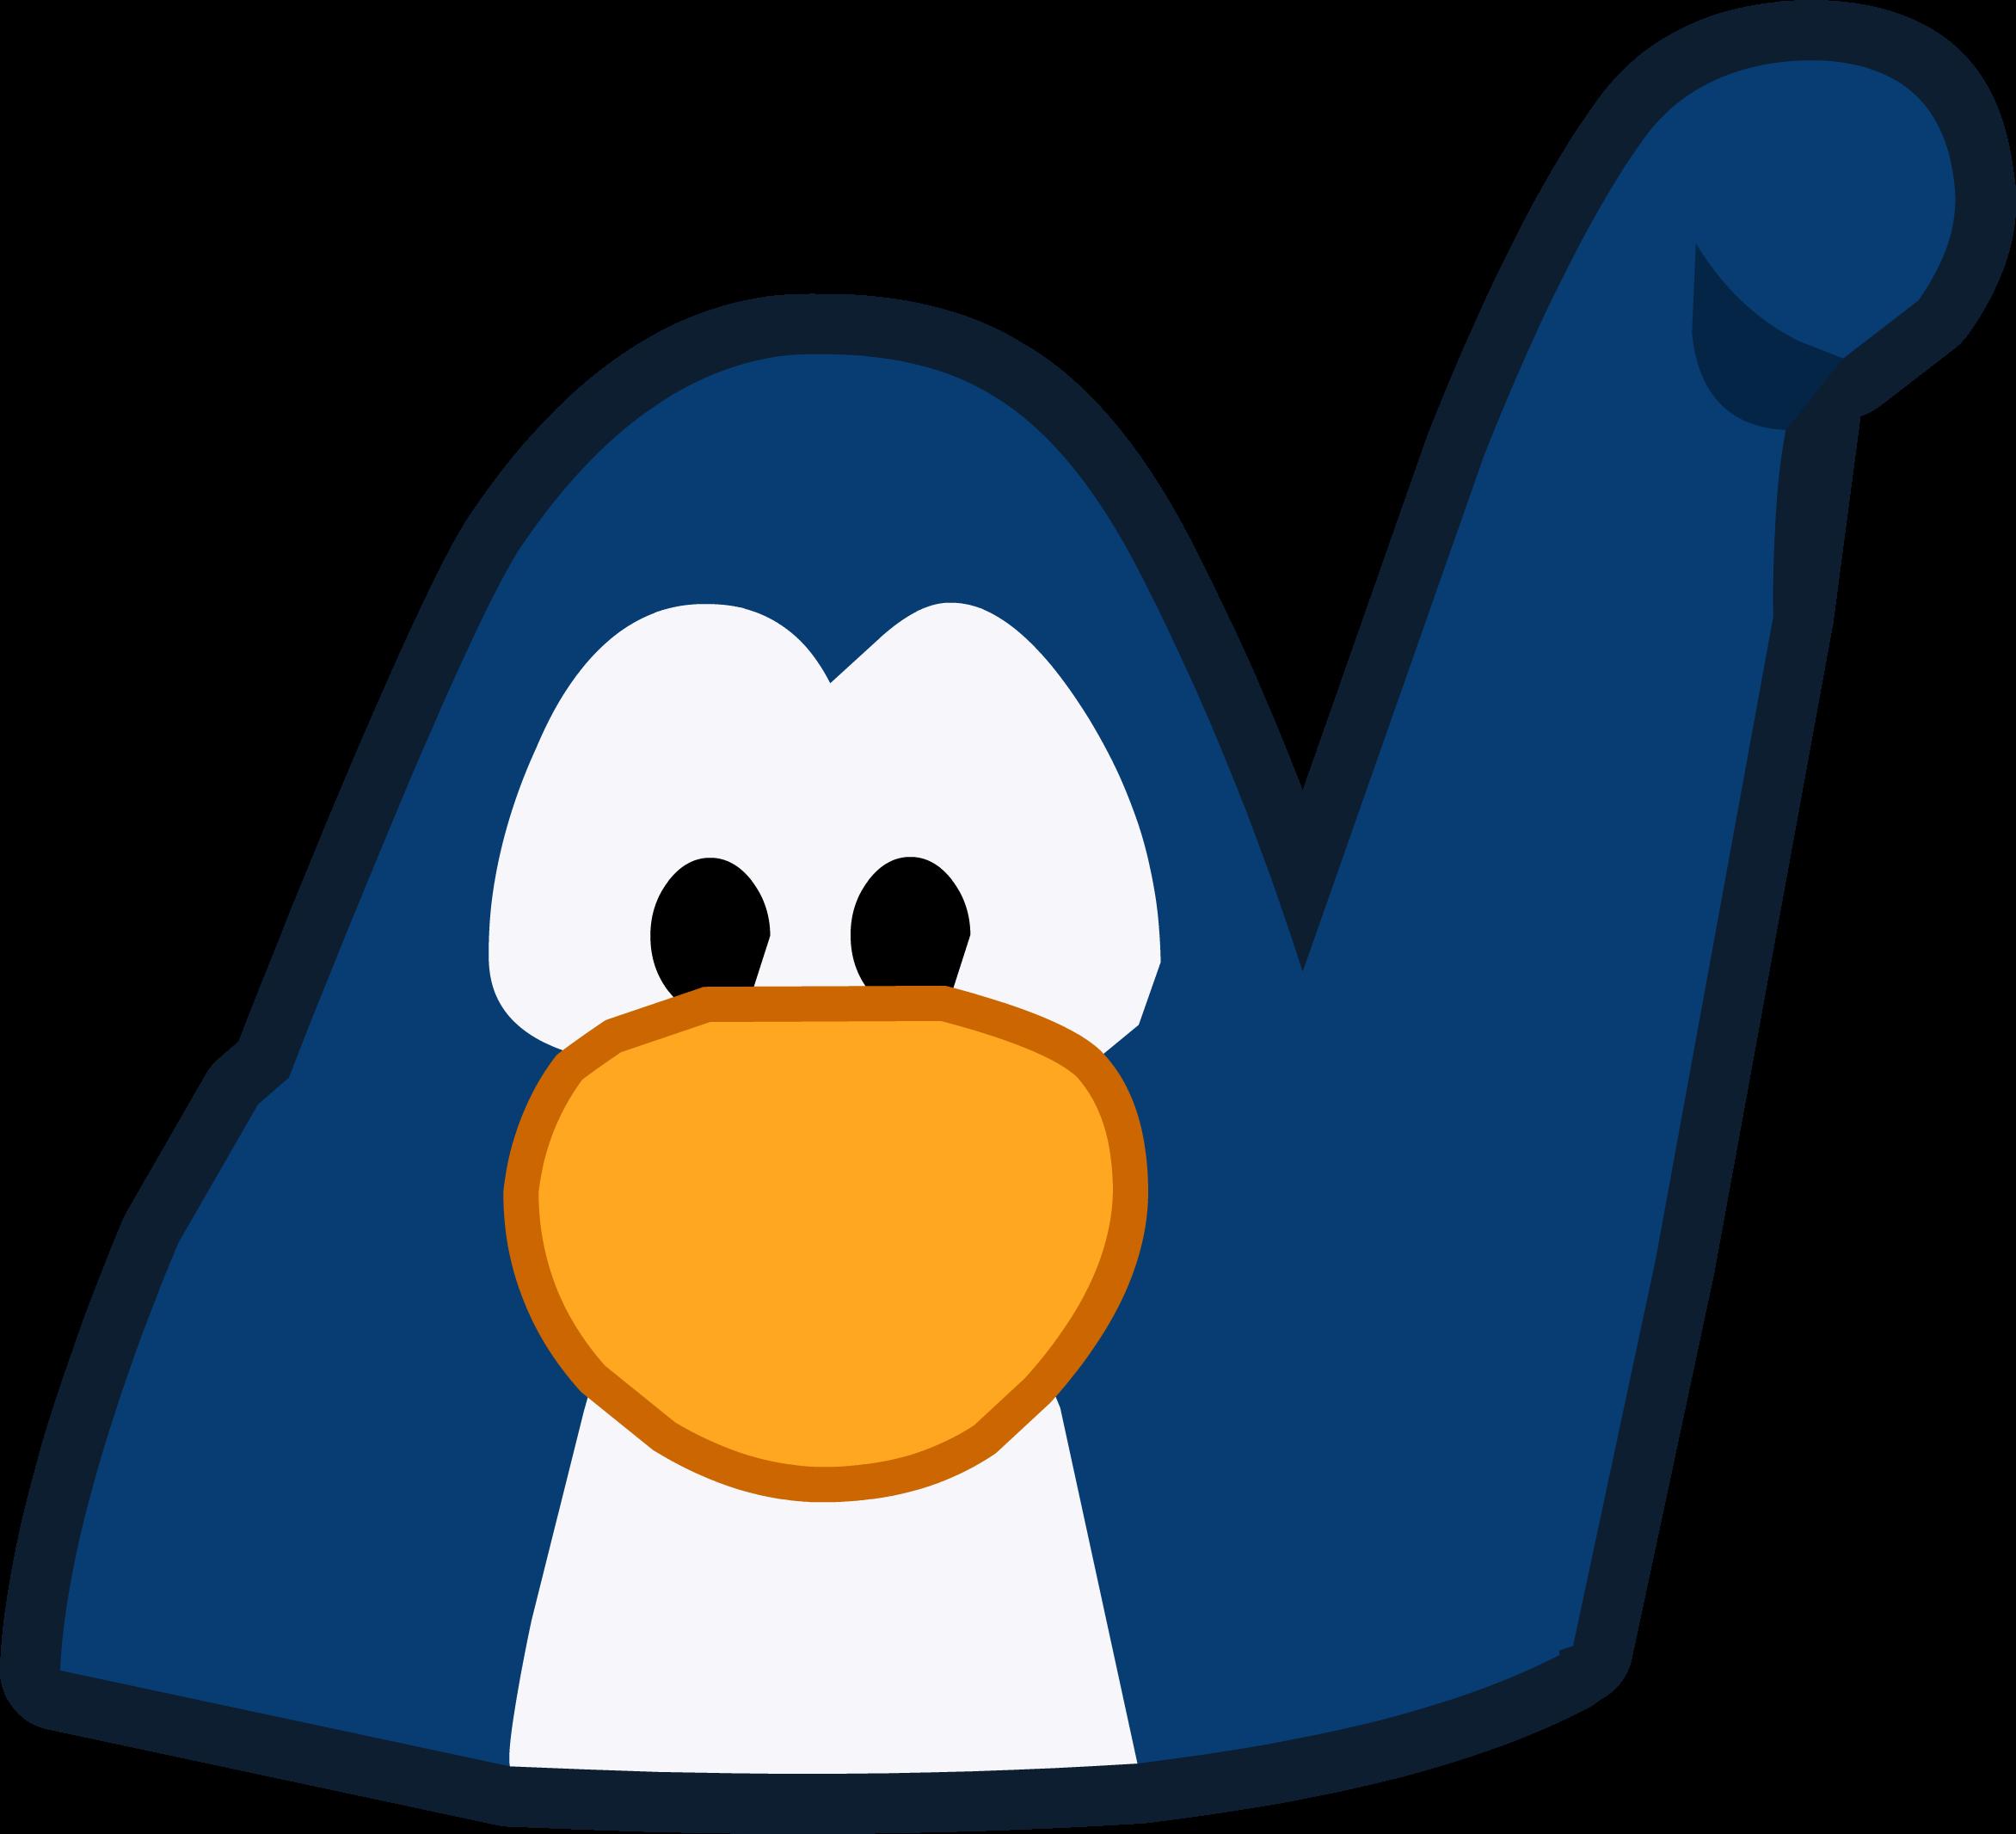 Festival de Música 2016 | Club Penguin Wiki | FANDOM powered by Wikia